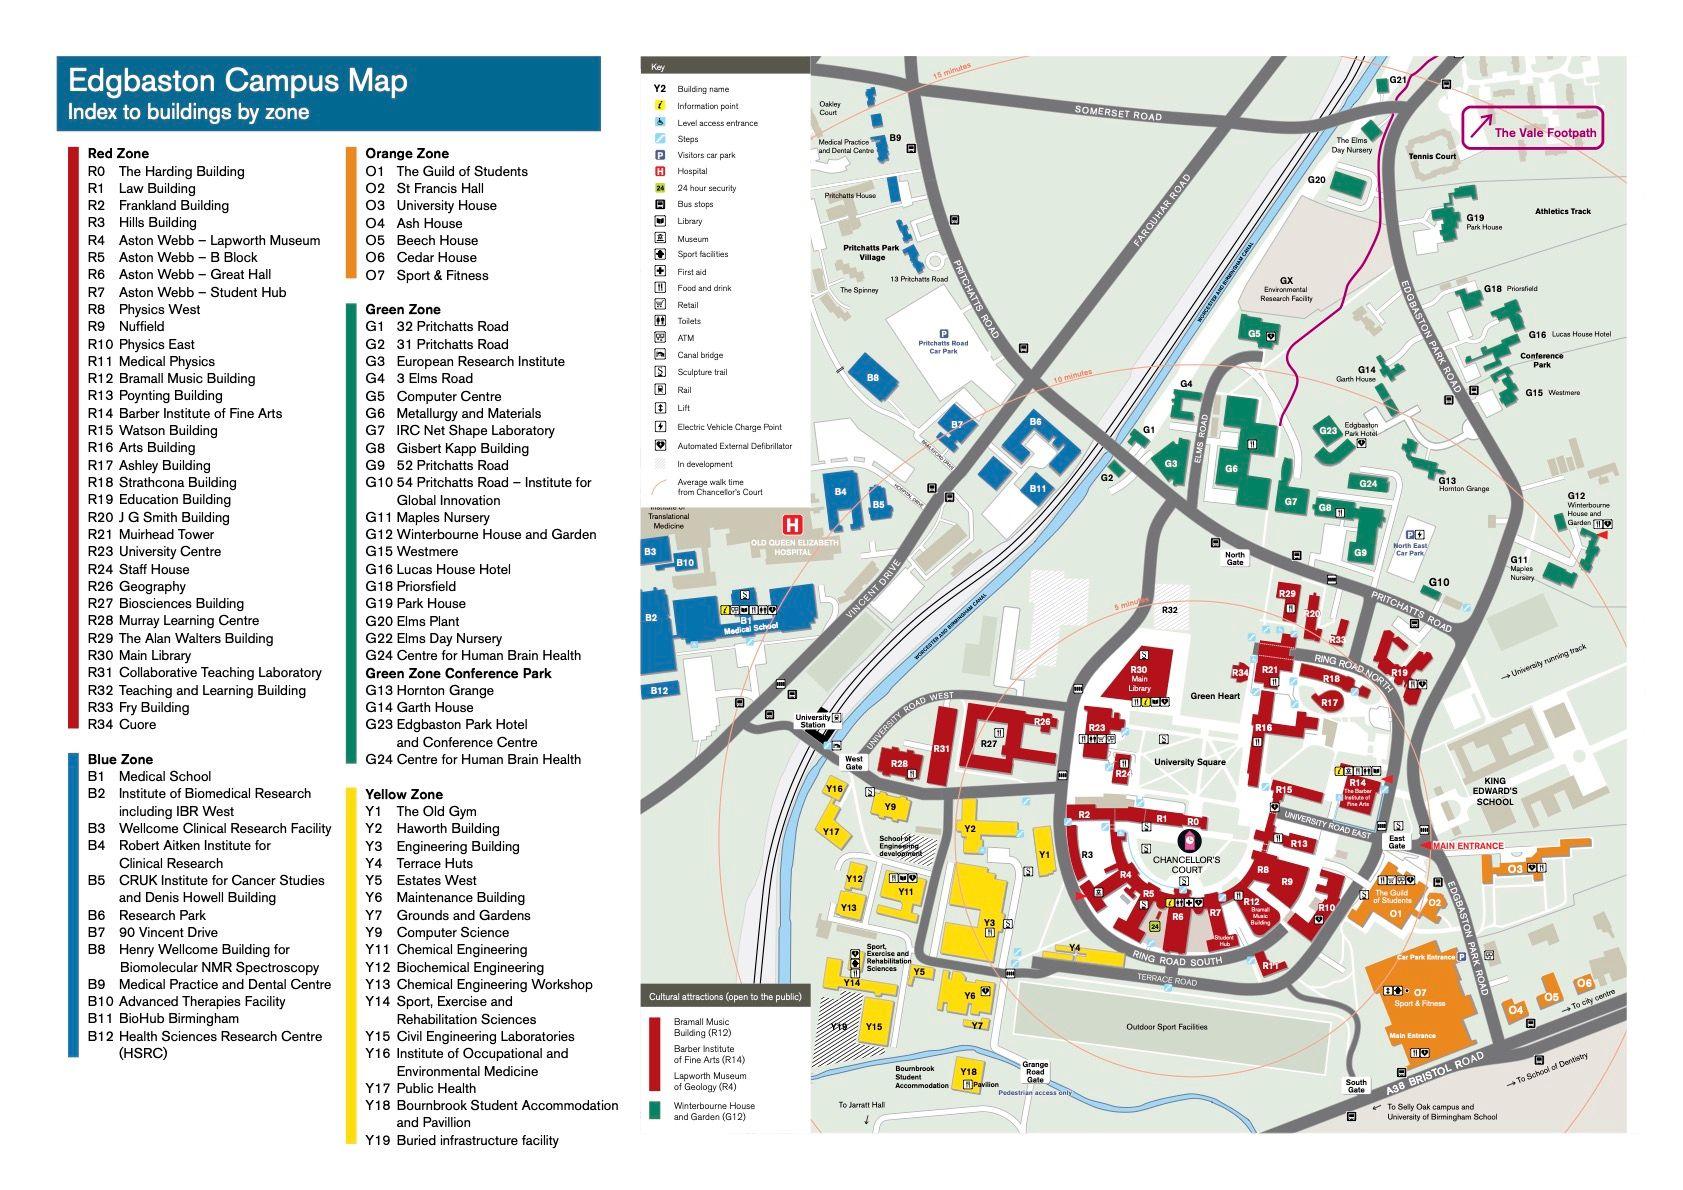 university of birmingham edgbaston